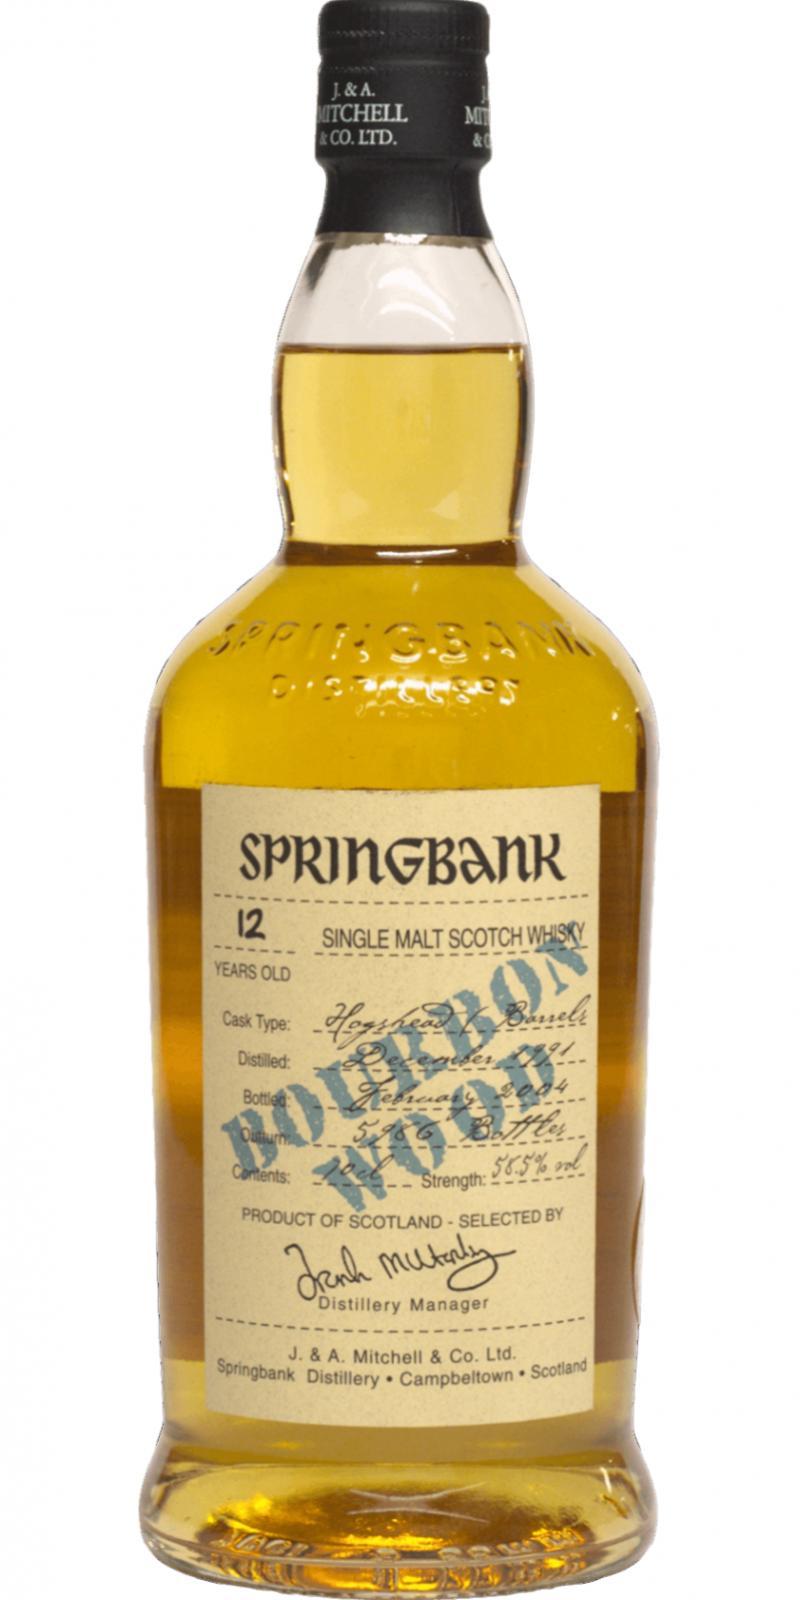 Springbank 1991 Bourbon